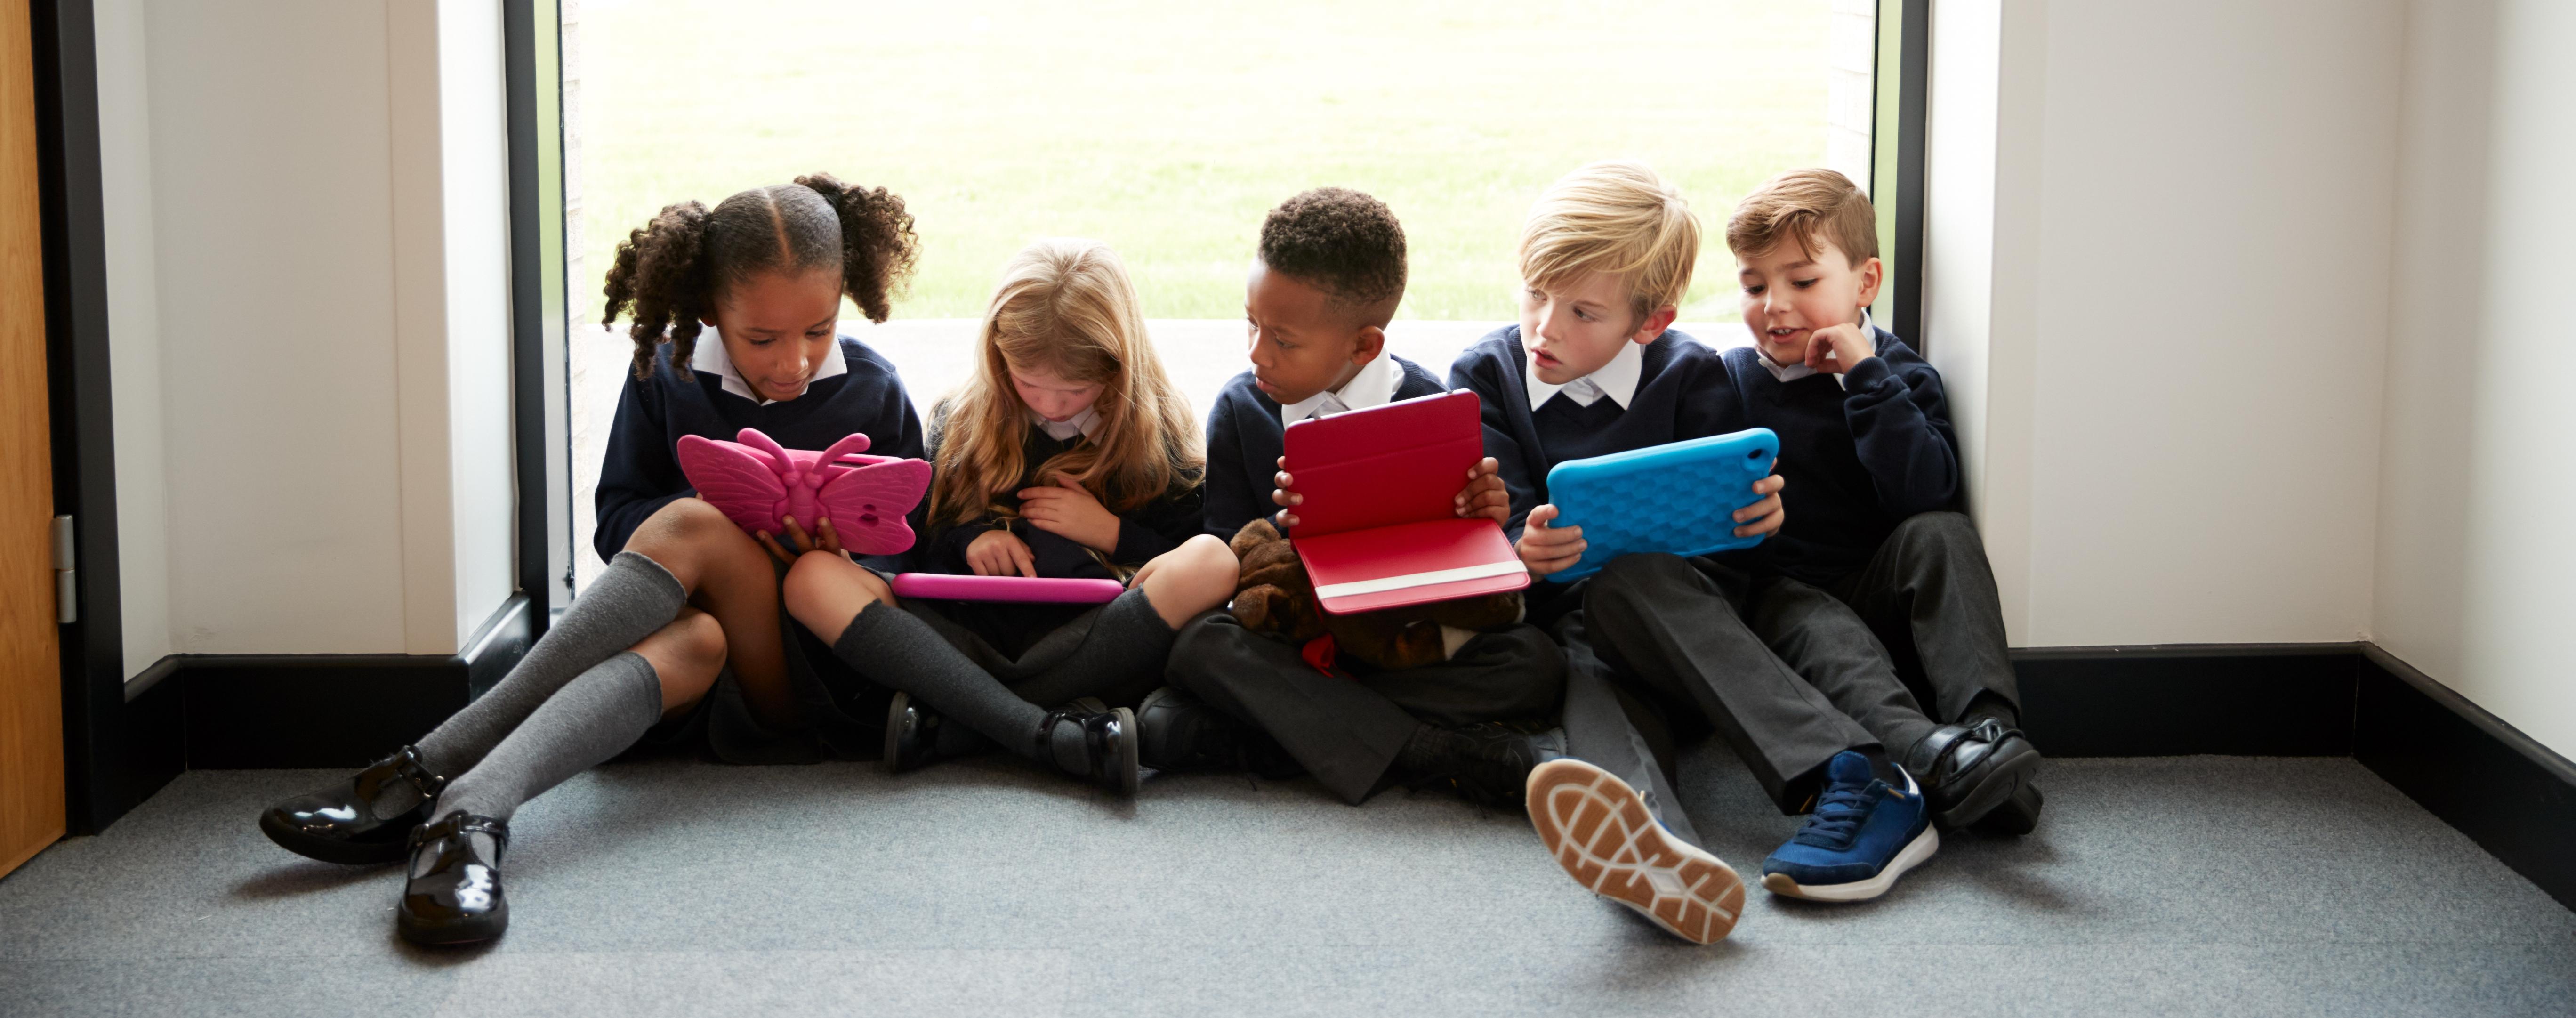 School children sitting on the floor